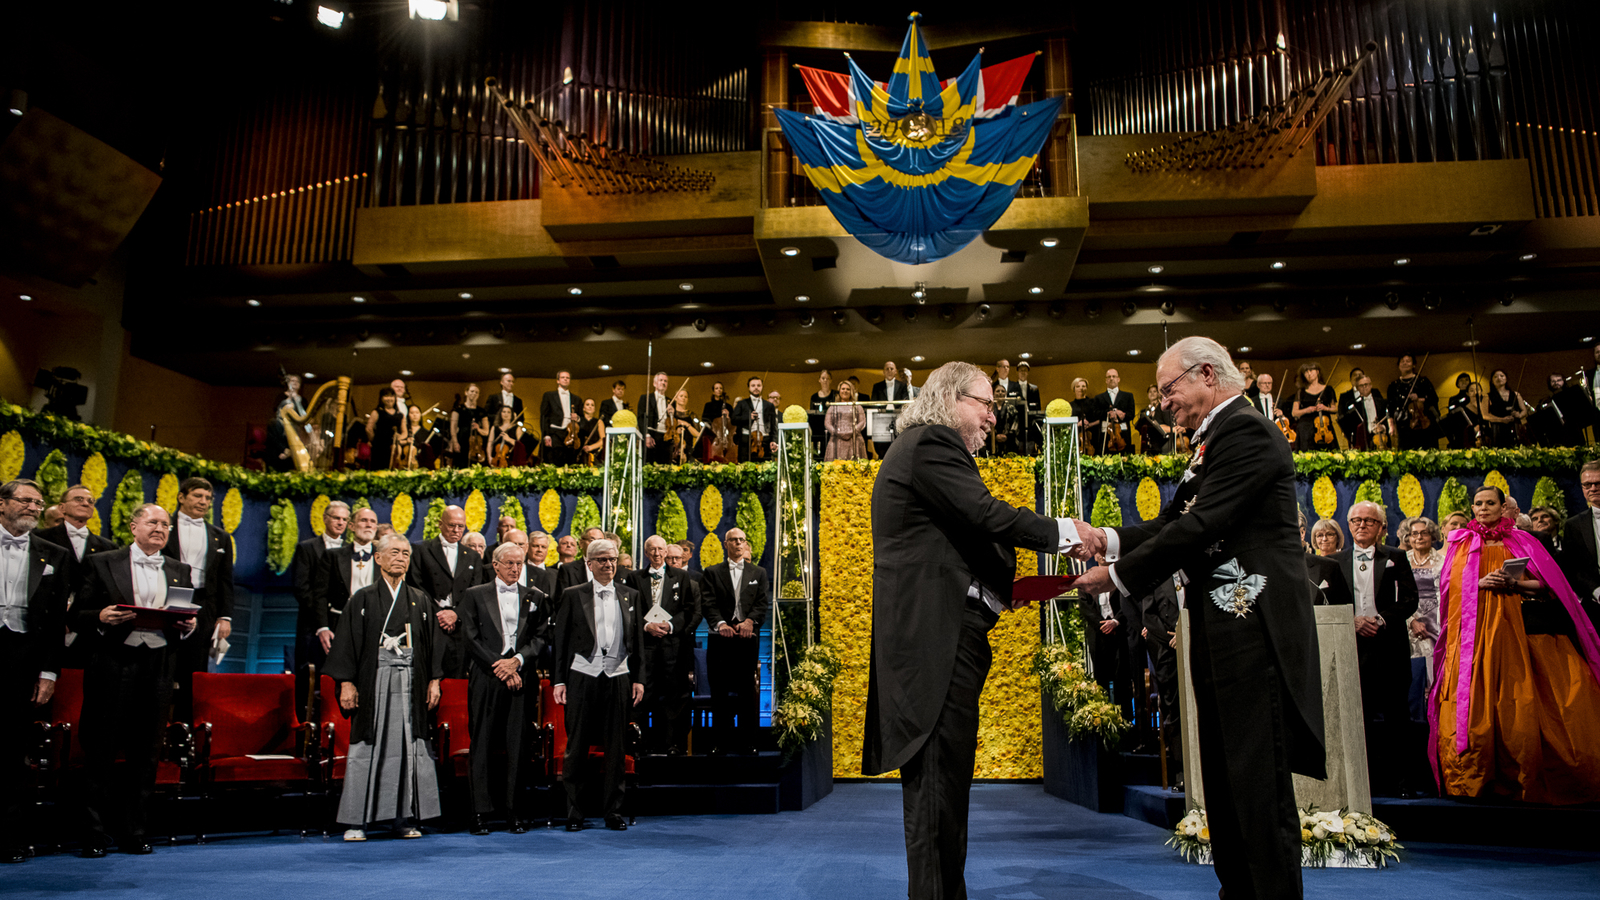 Dr. Jim Allison at the 2018 Nobel Prize Award Ceremony